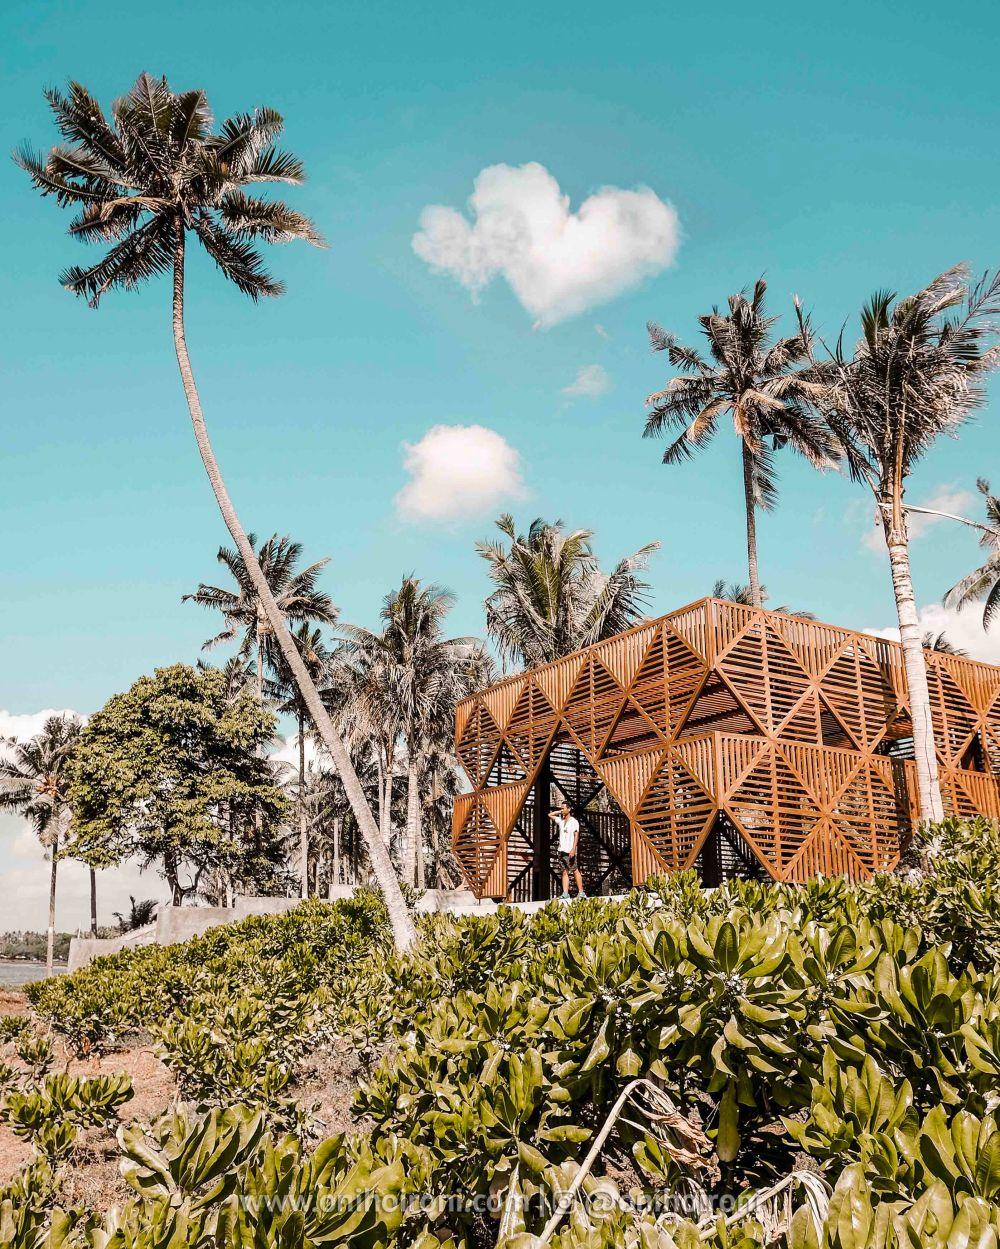 6 Spot instagramable Review Hotel Dialoog Banyuwangi oni hoironi